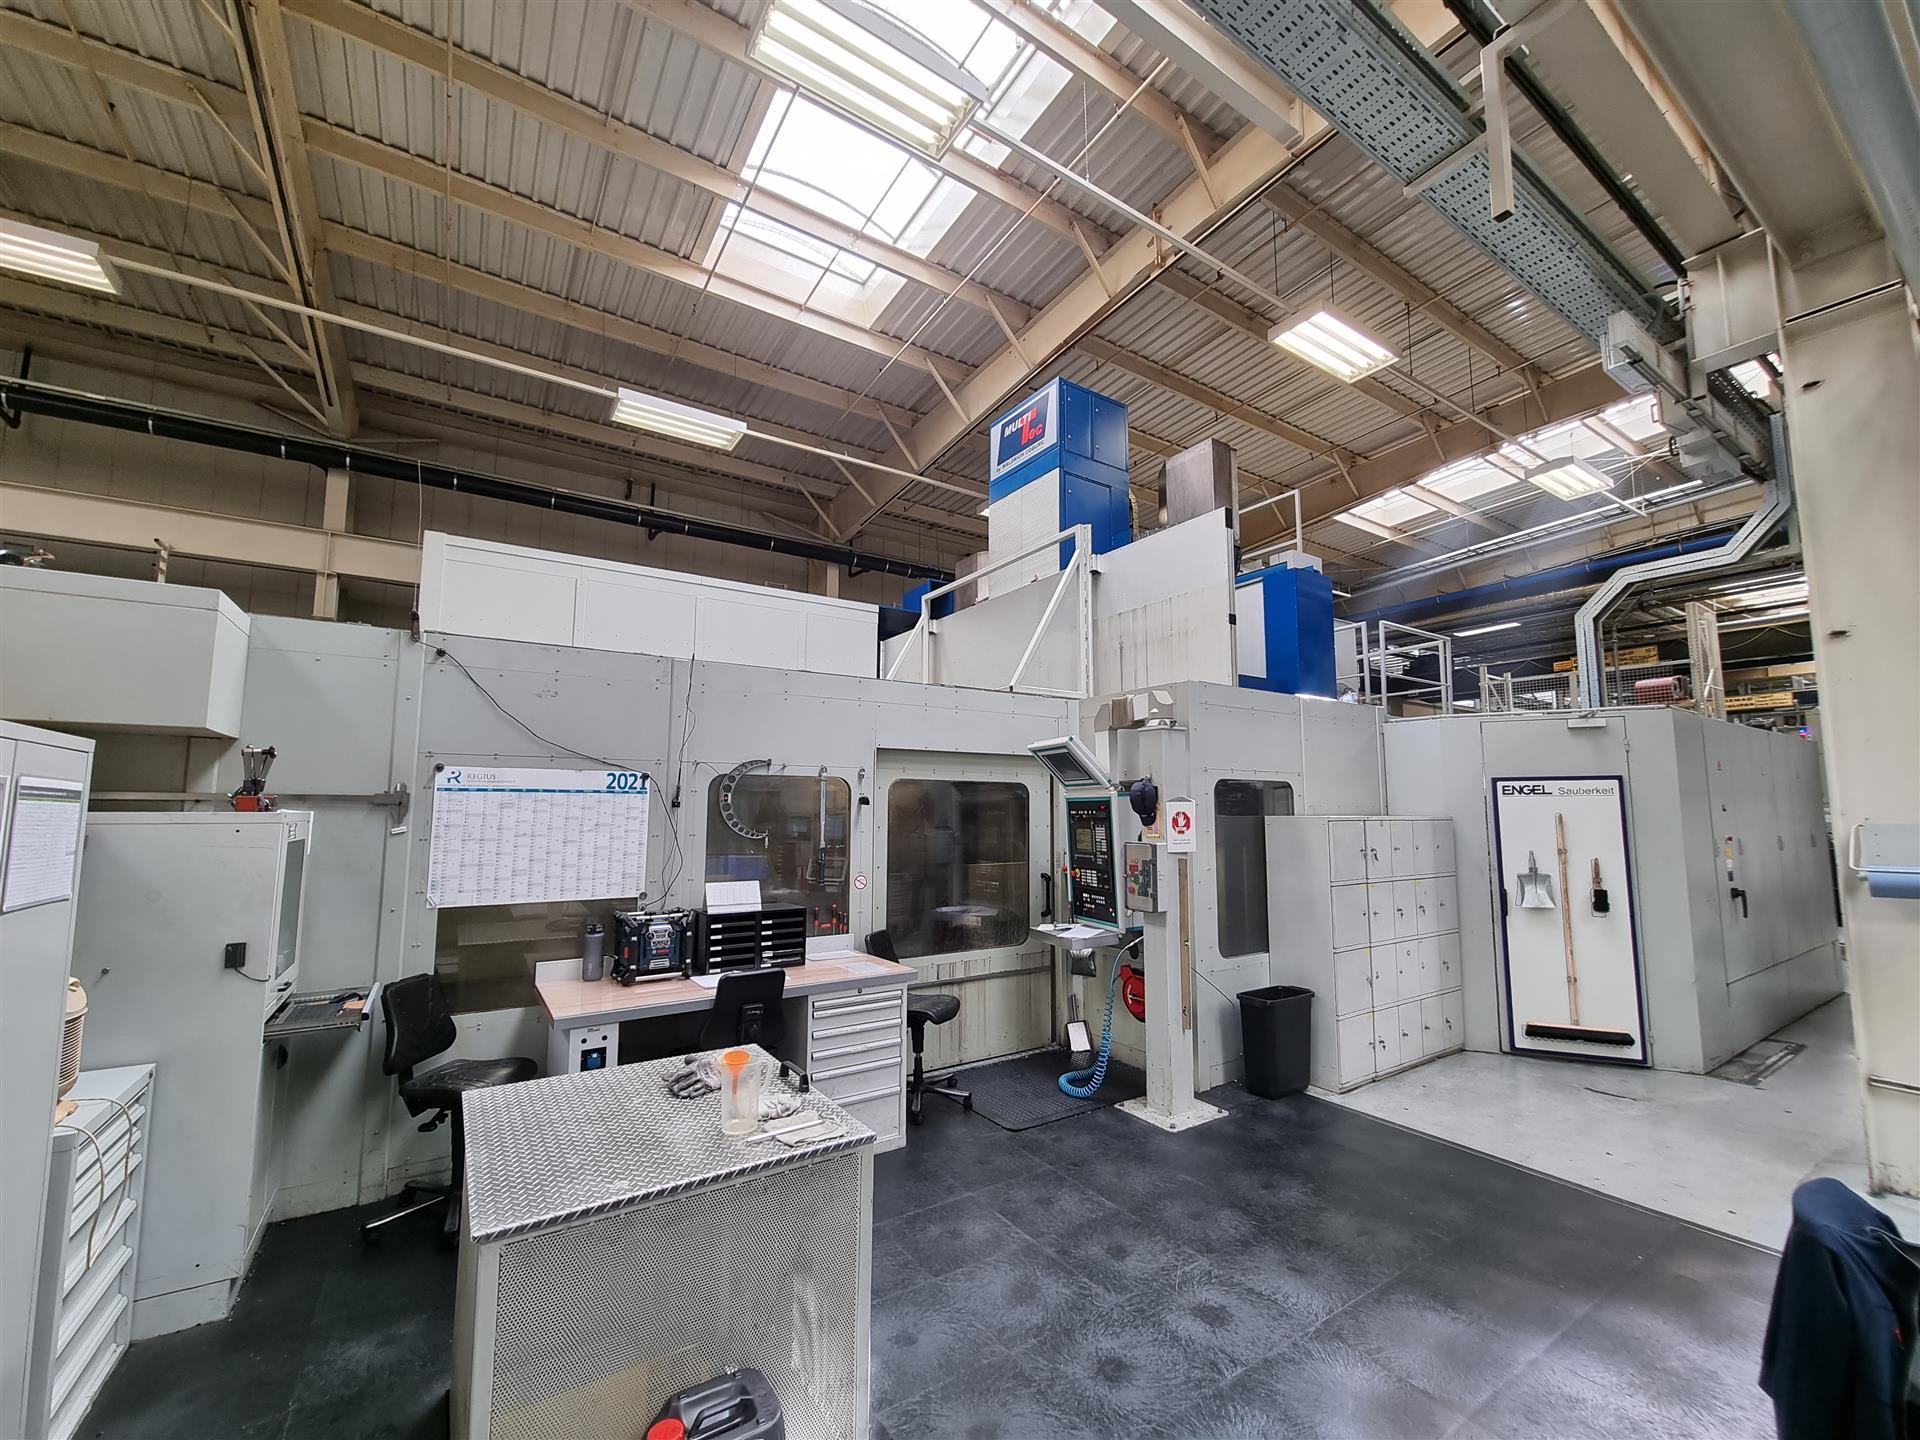 Waldrich Coburg Multitec 2500 - 2008 - 7000 x 2500 mm